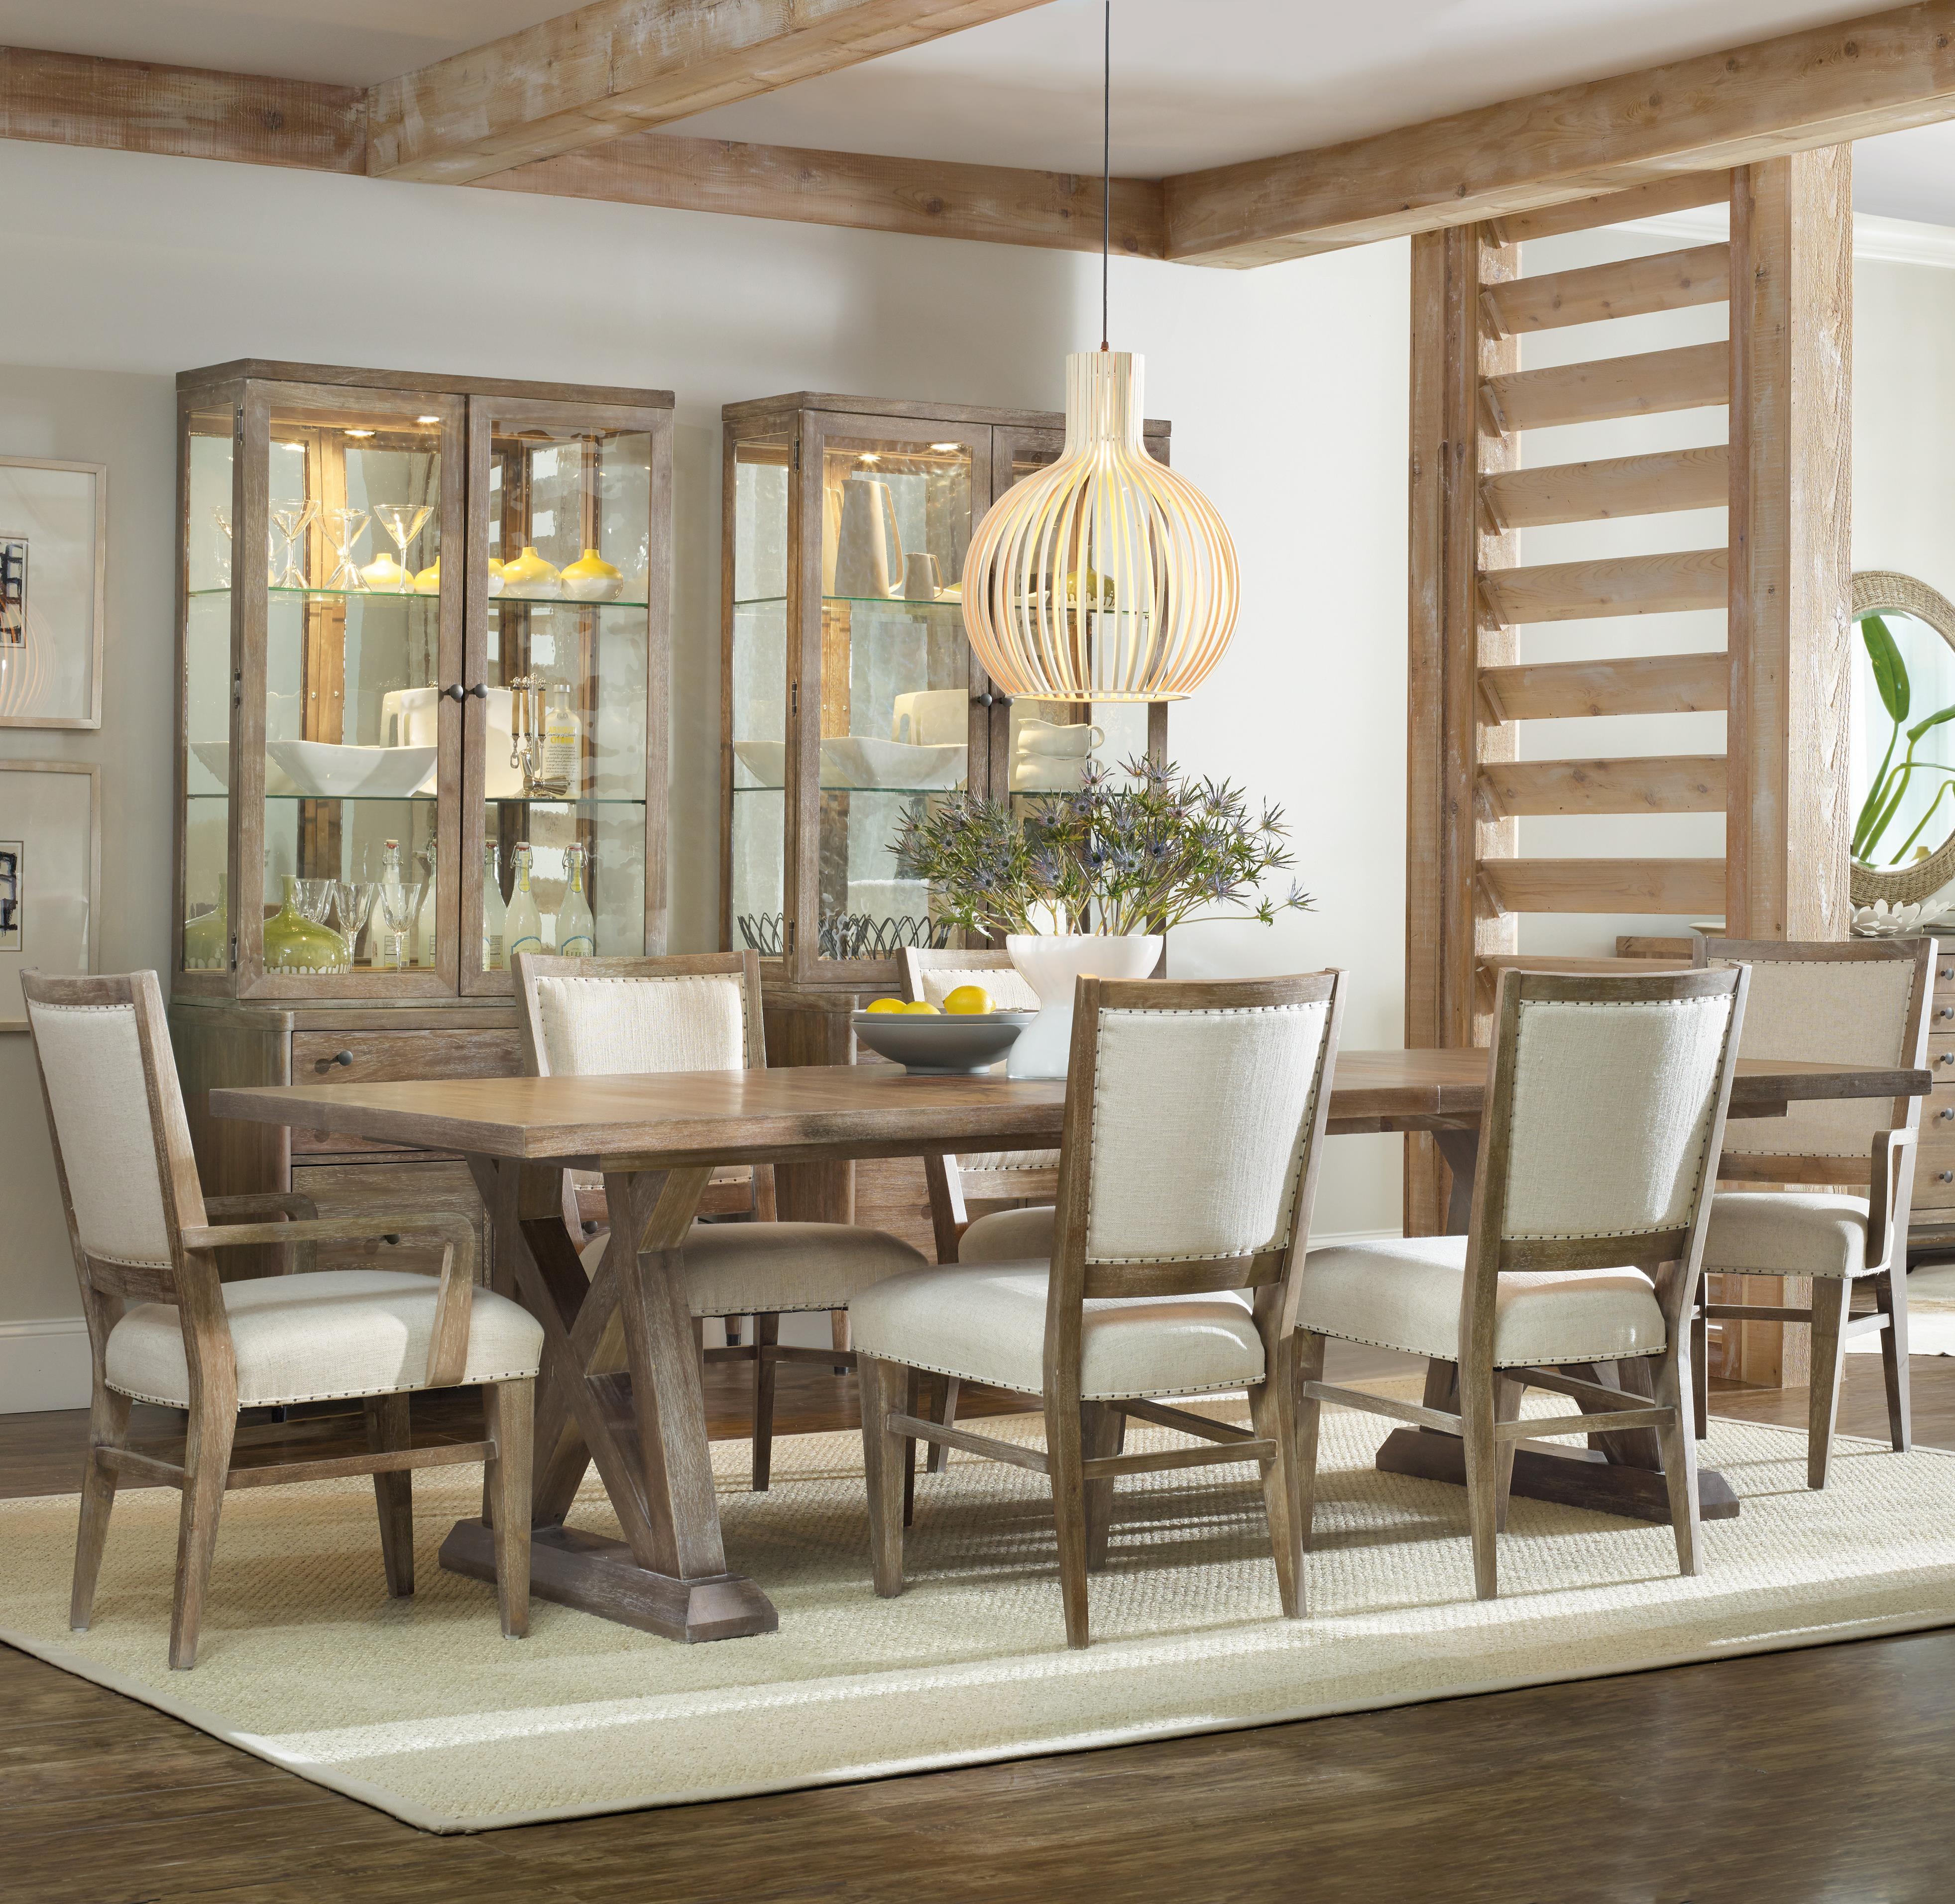 Hooker Furniture Studio 7H 7 Piece Dining Set - Item Number: 5382-75207+2x400+4x410